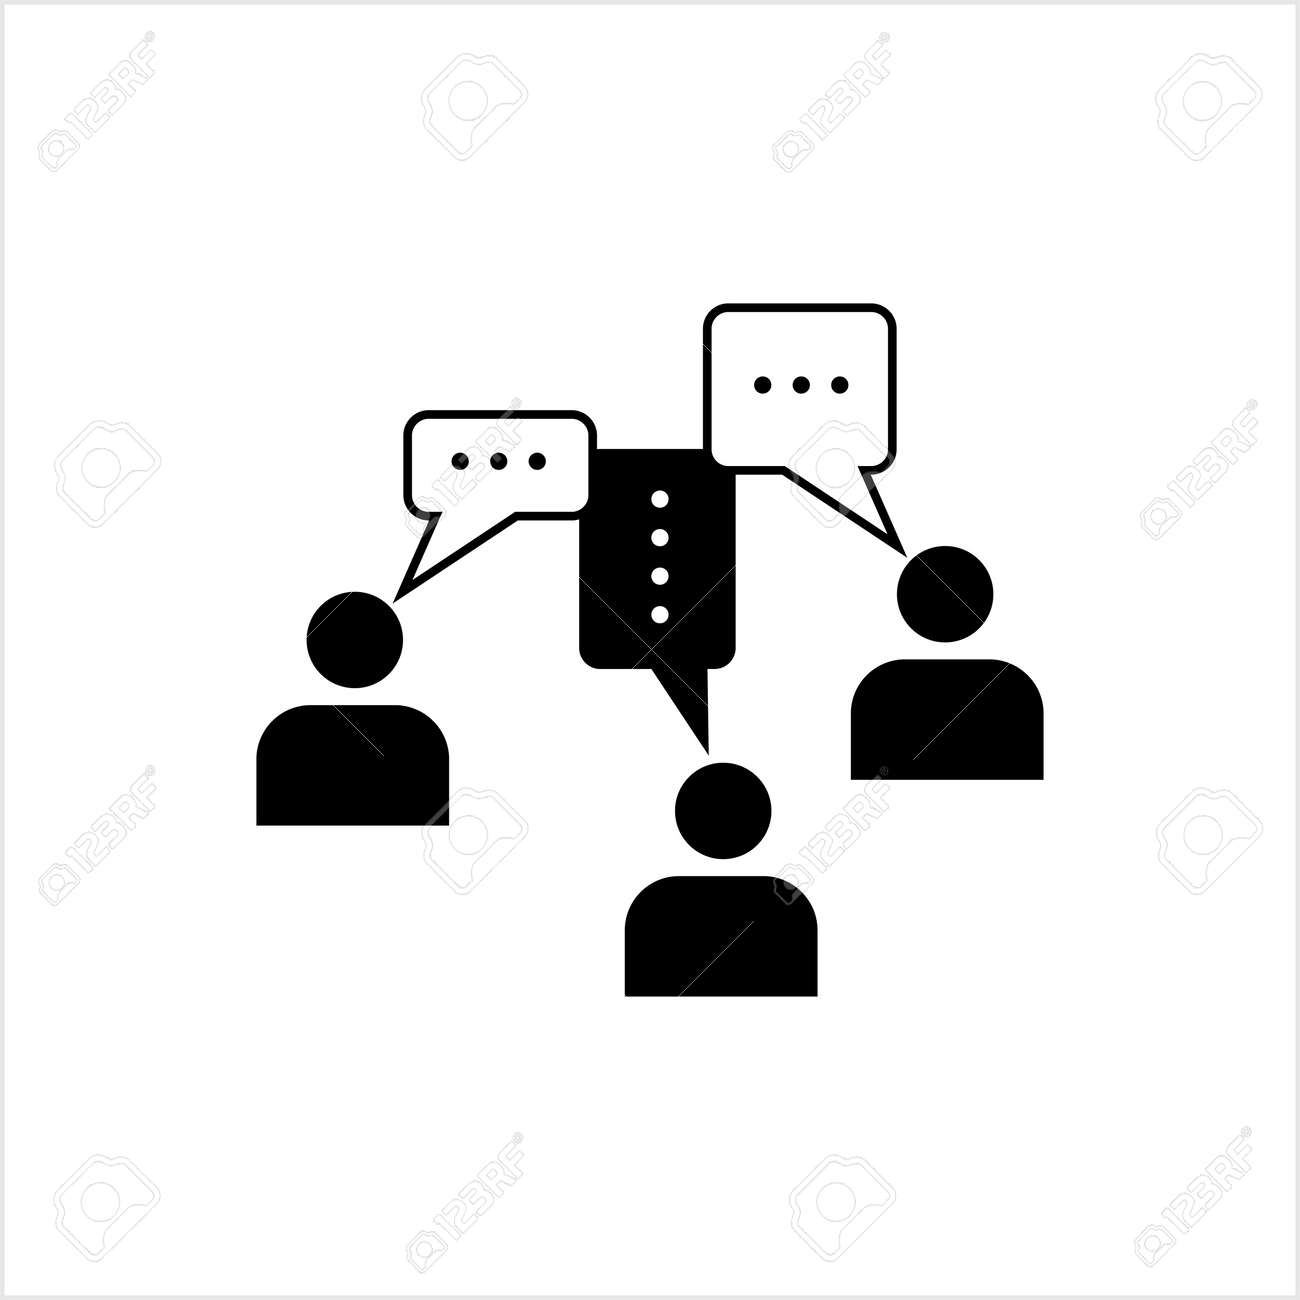 Communication Icon, Business, Social Communication Icon Vector Art Illustration - 148095205